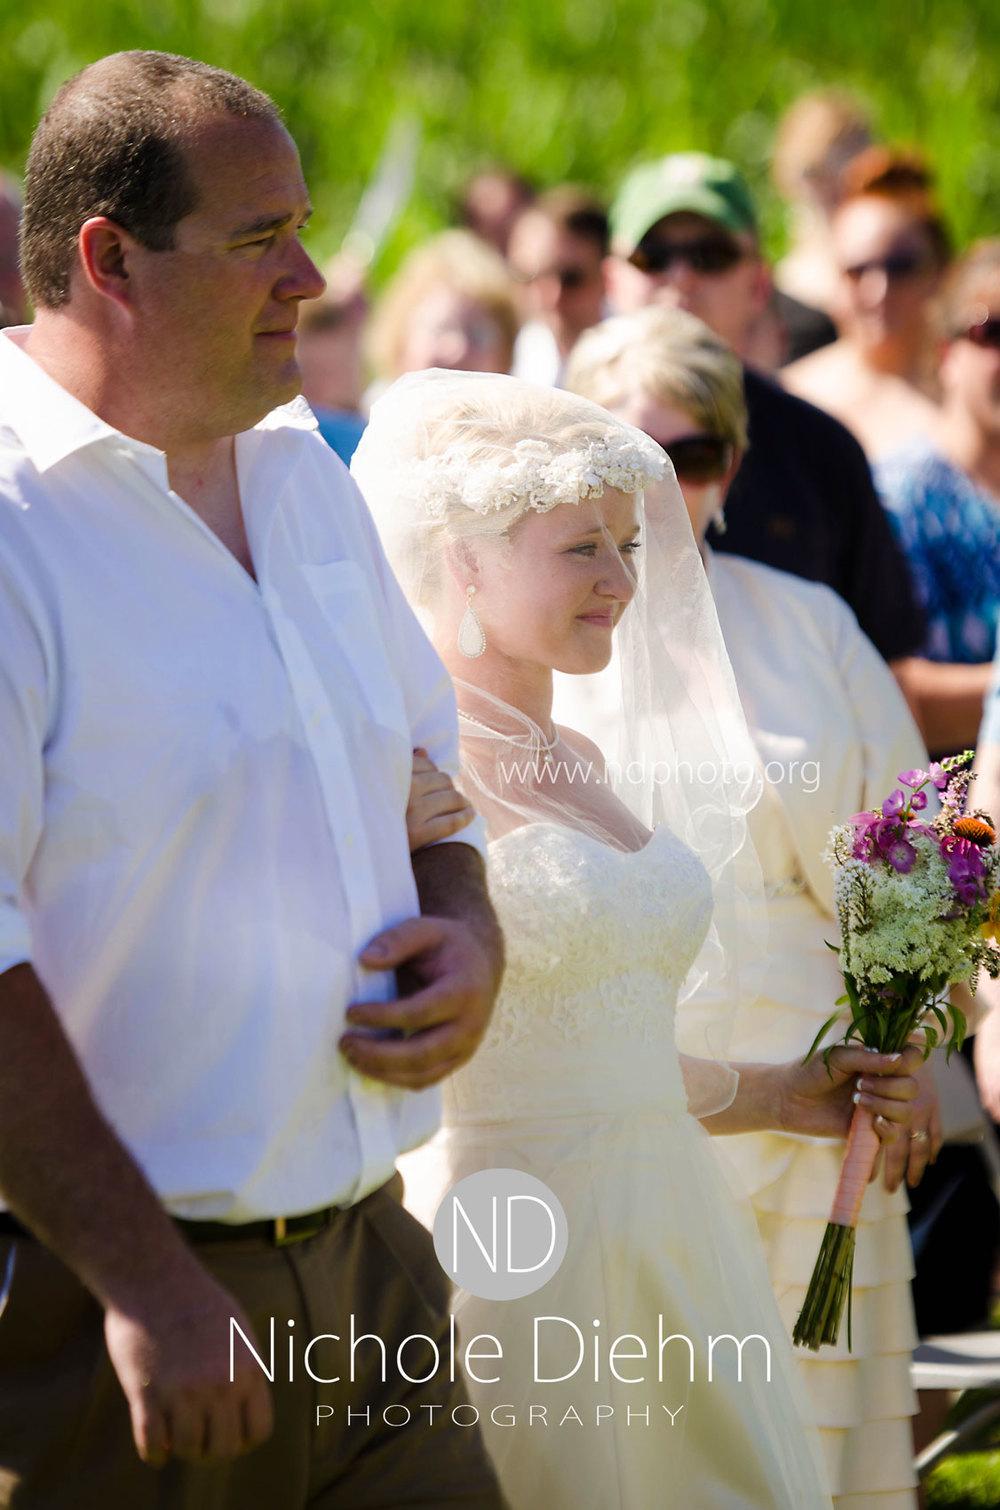 Sarah-and-Josh-Elsbecker-Outdoor-Wedding-Waterloo-Iowa-Photography-18.jpg